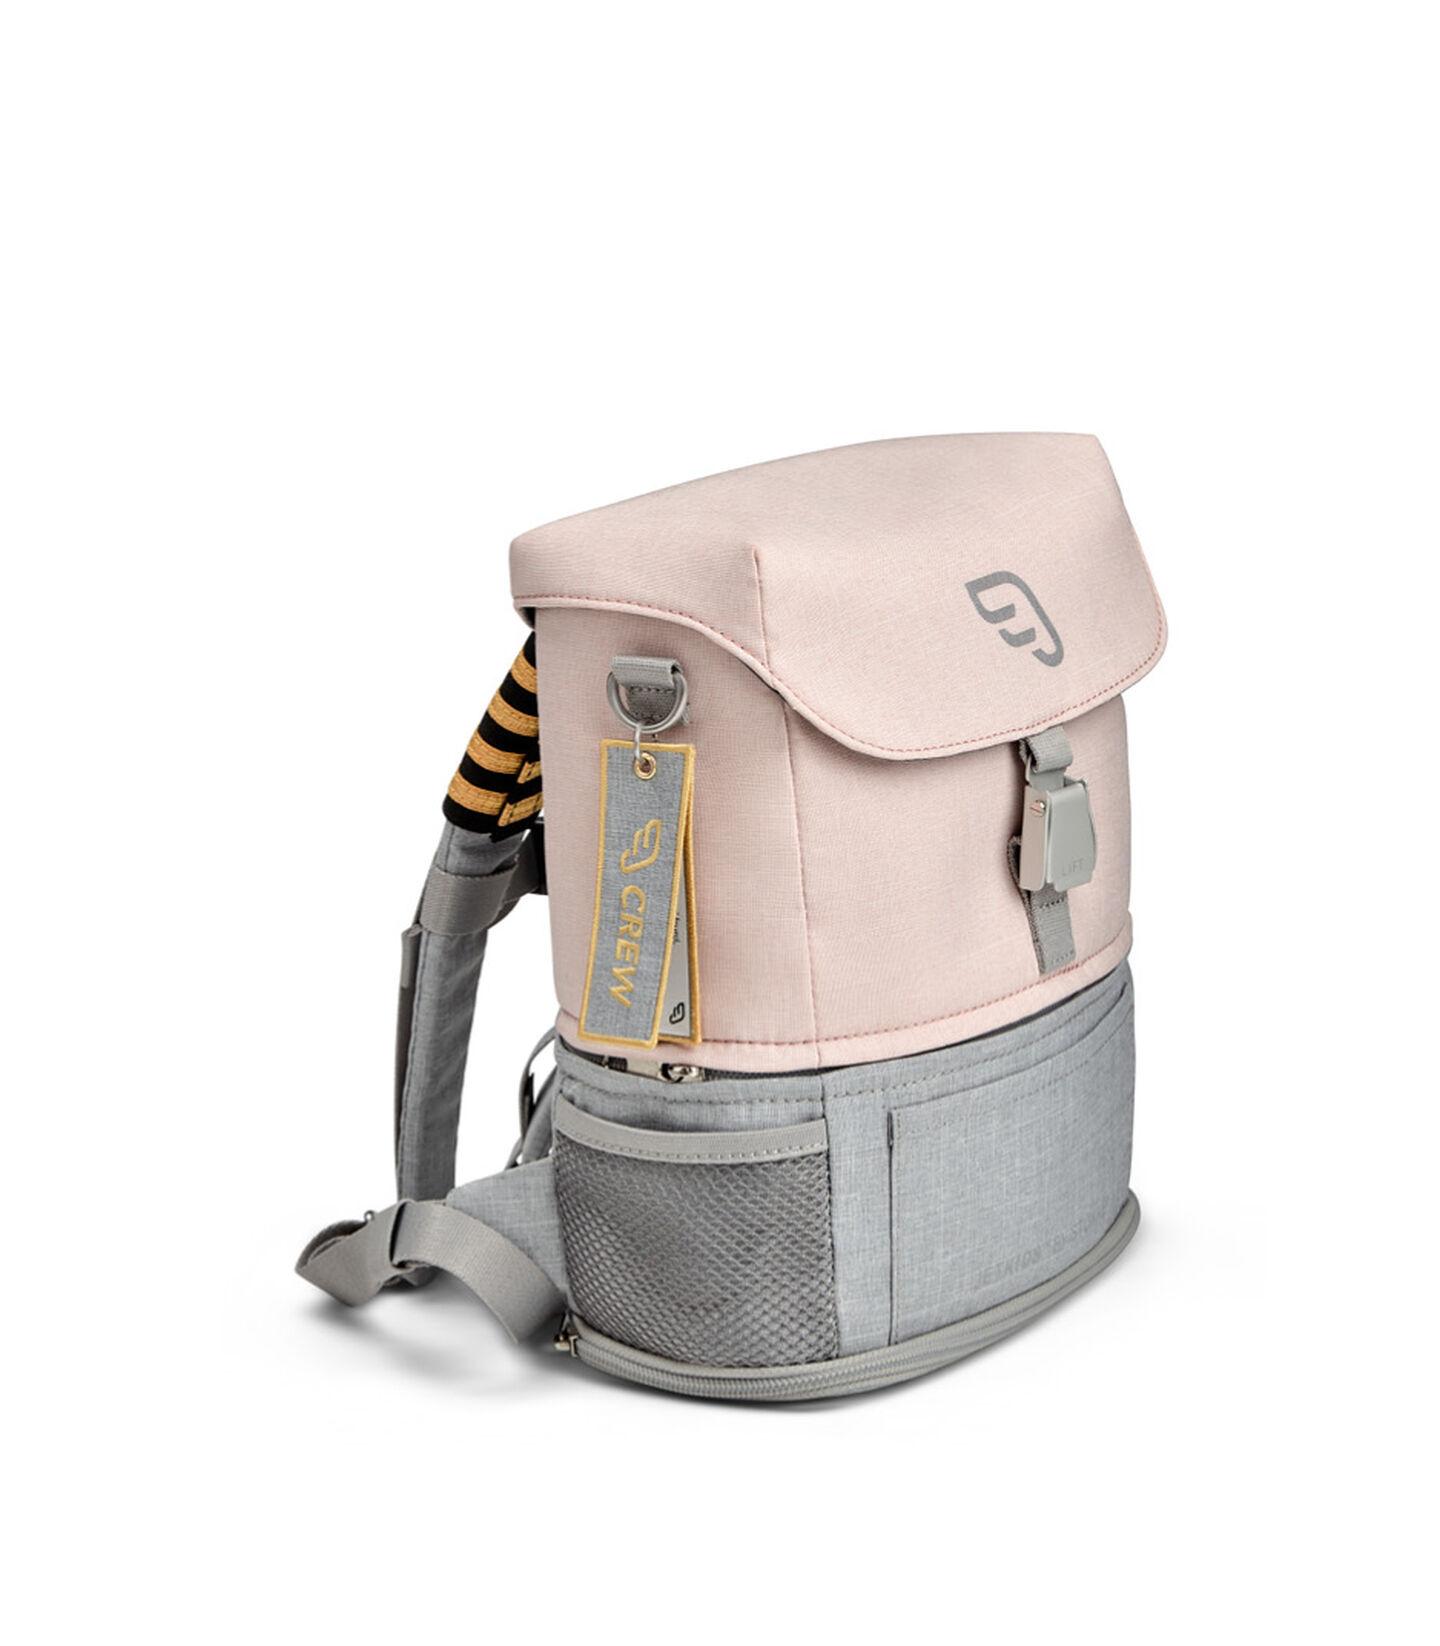 JetKids™ by Stokke® Crew BackPack Pink Lemonade view 2